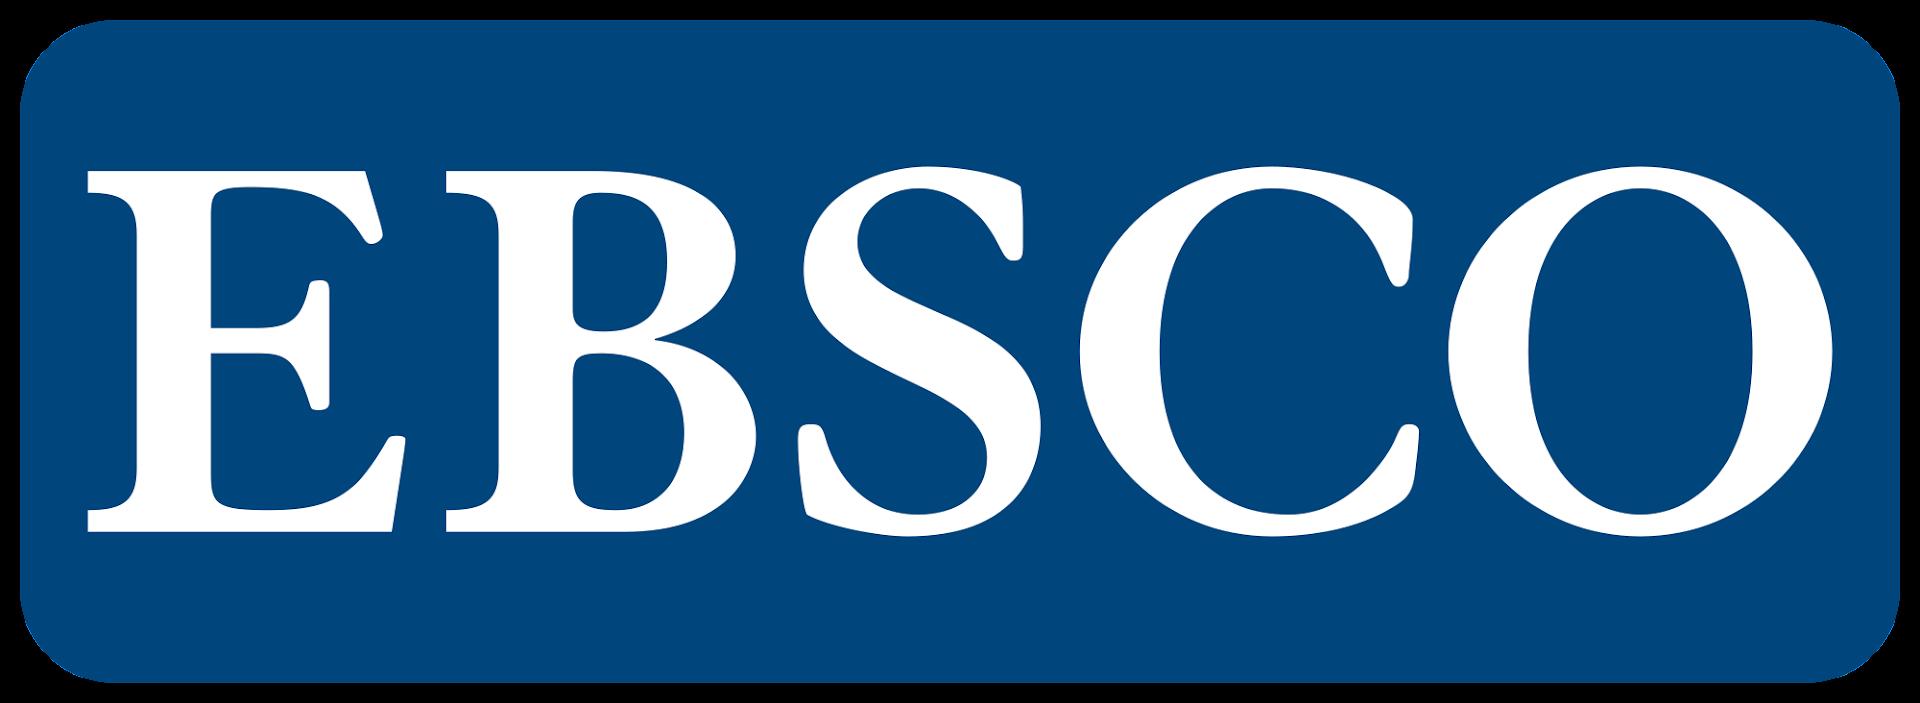 EBSCOhost Member Badge